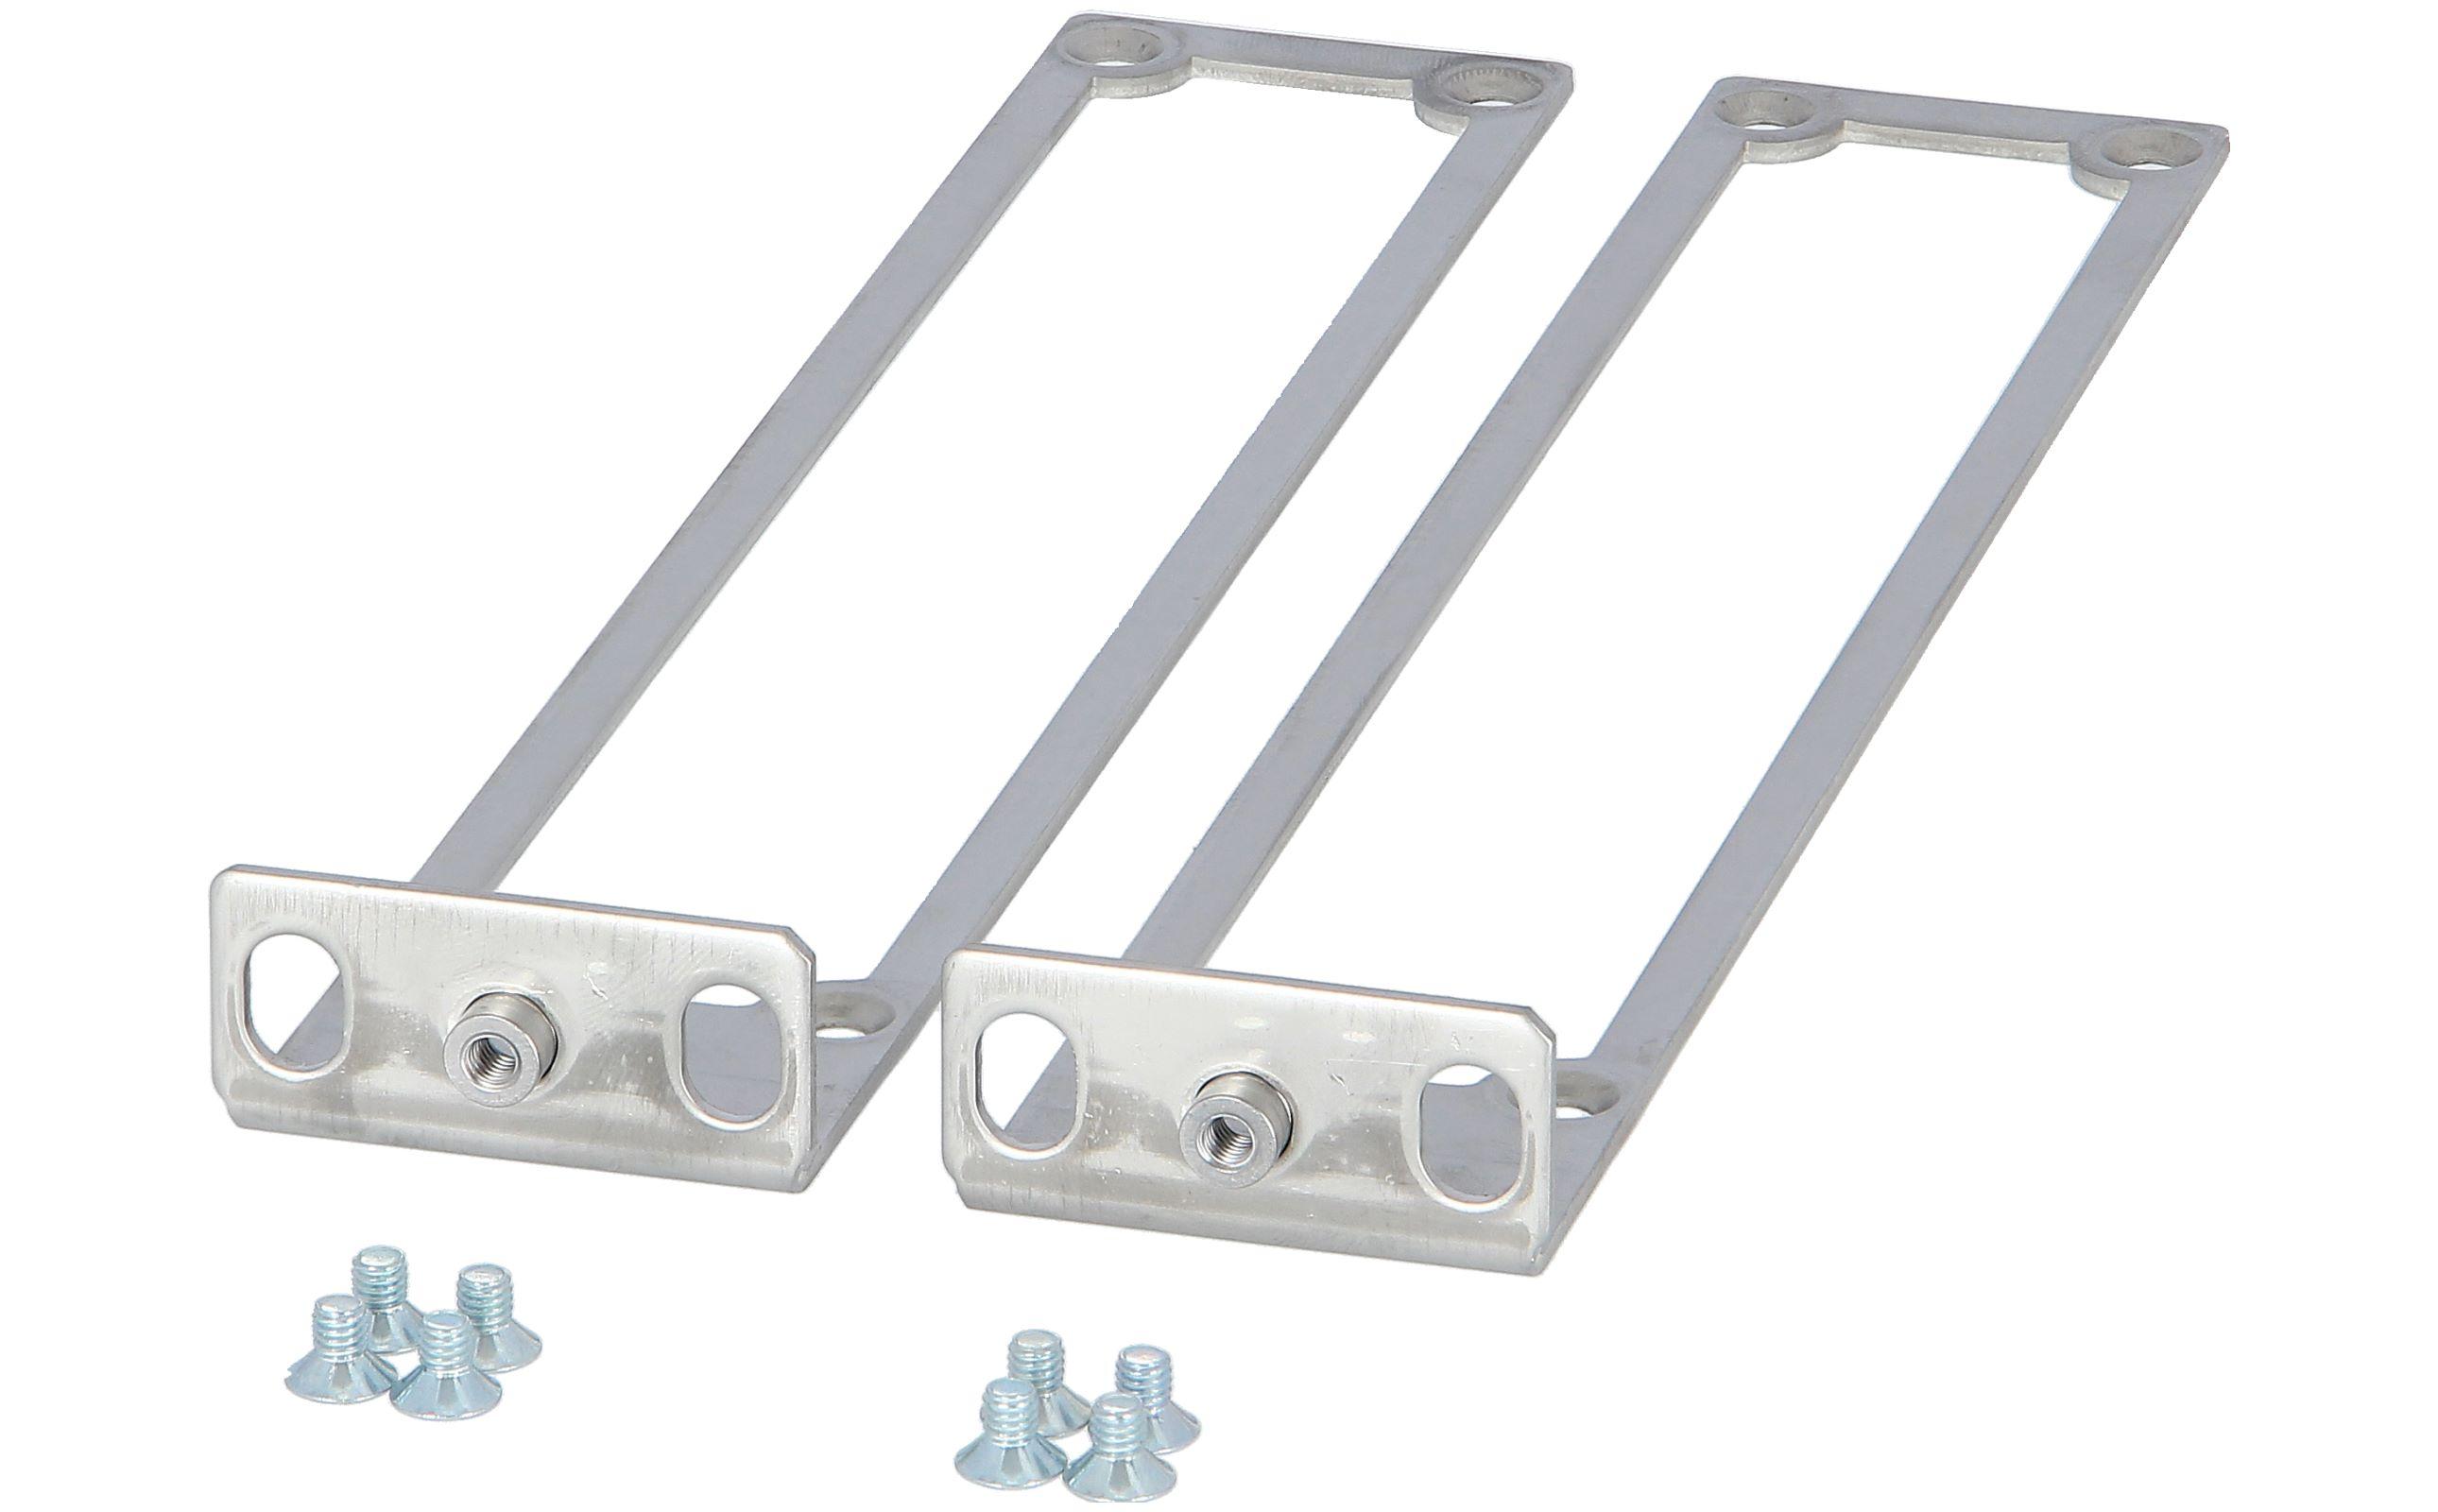 RACK MOUNT KIT  for EX2200 Series Switch  EX-RMK